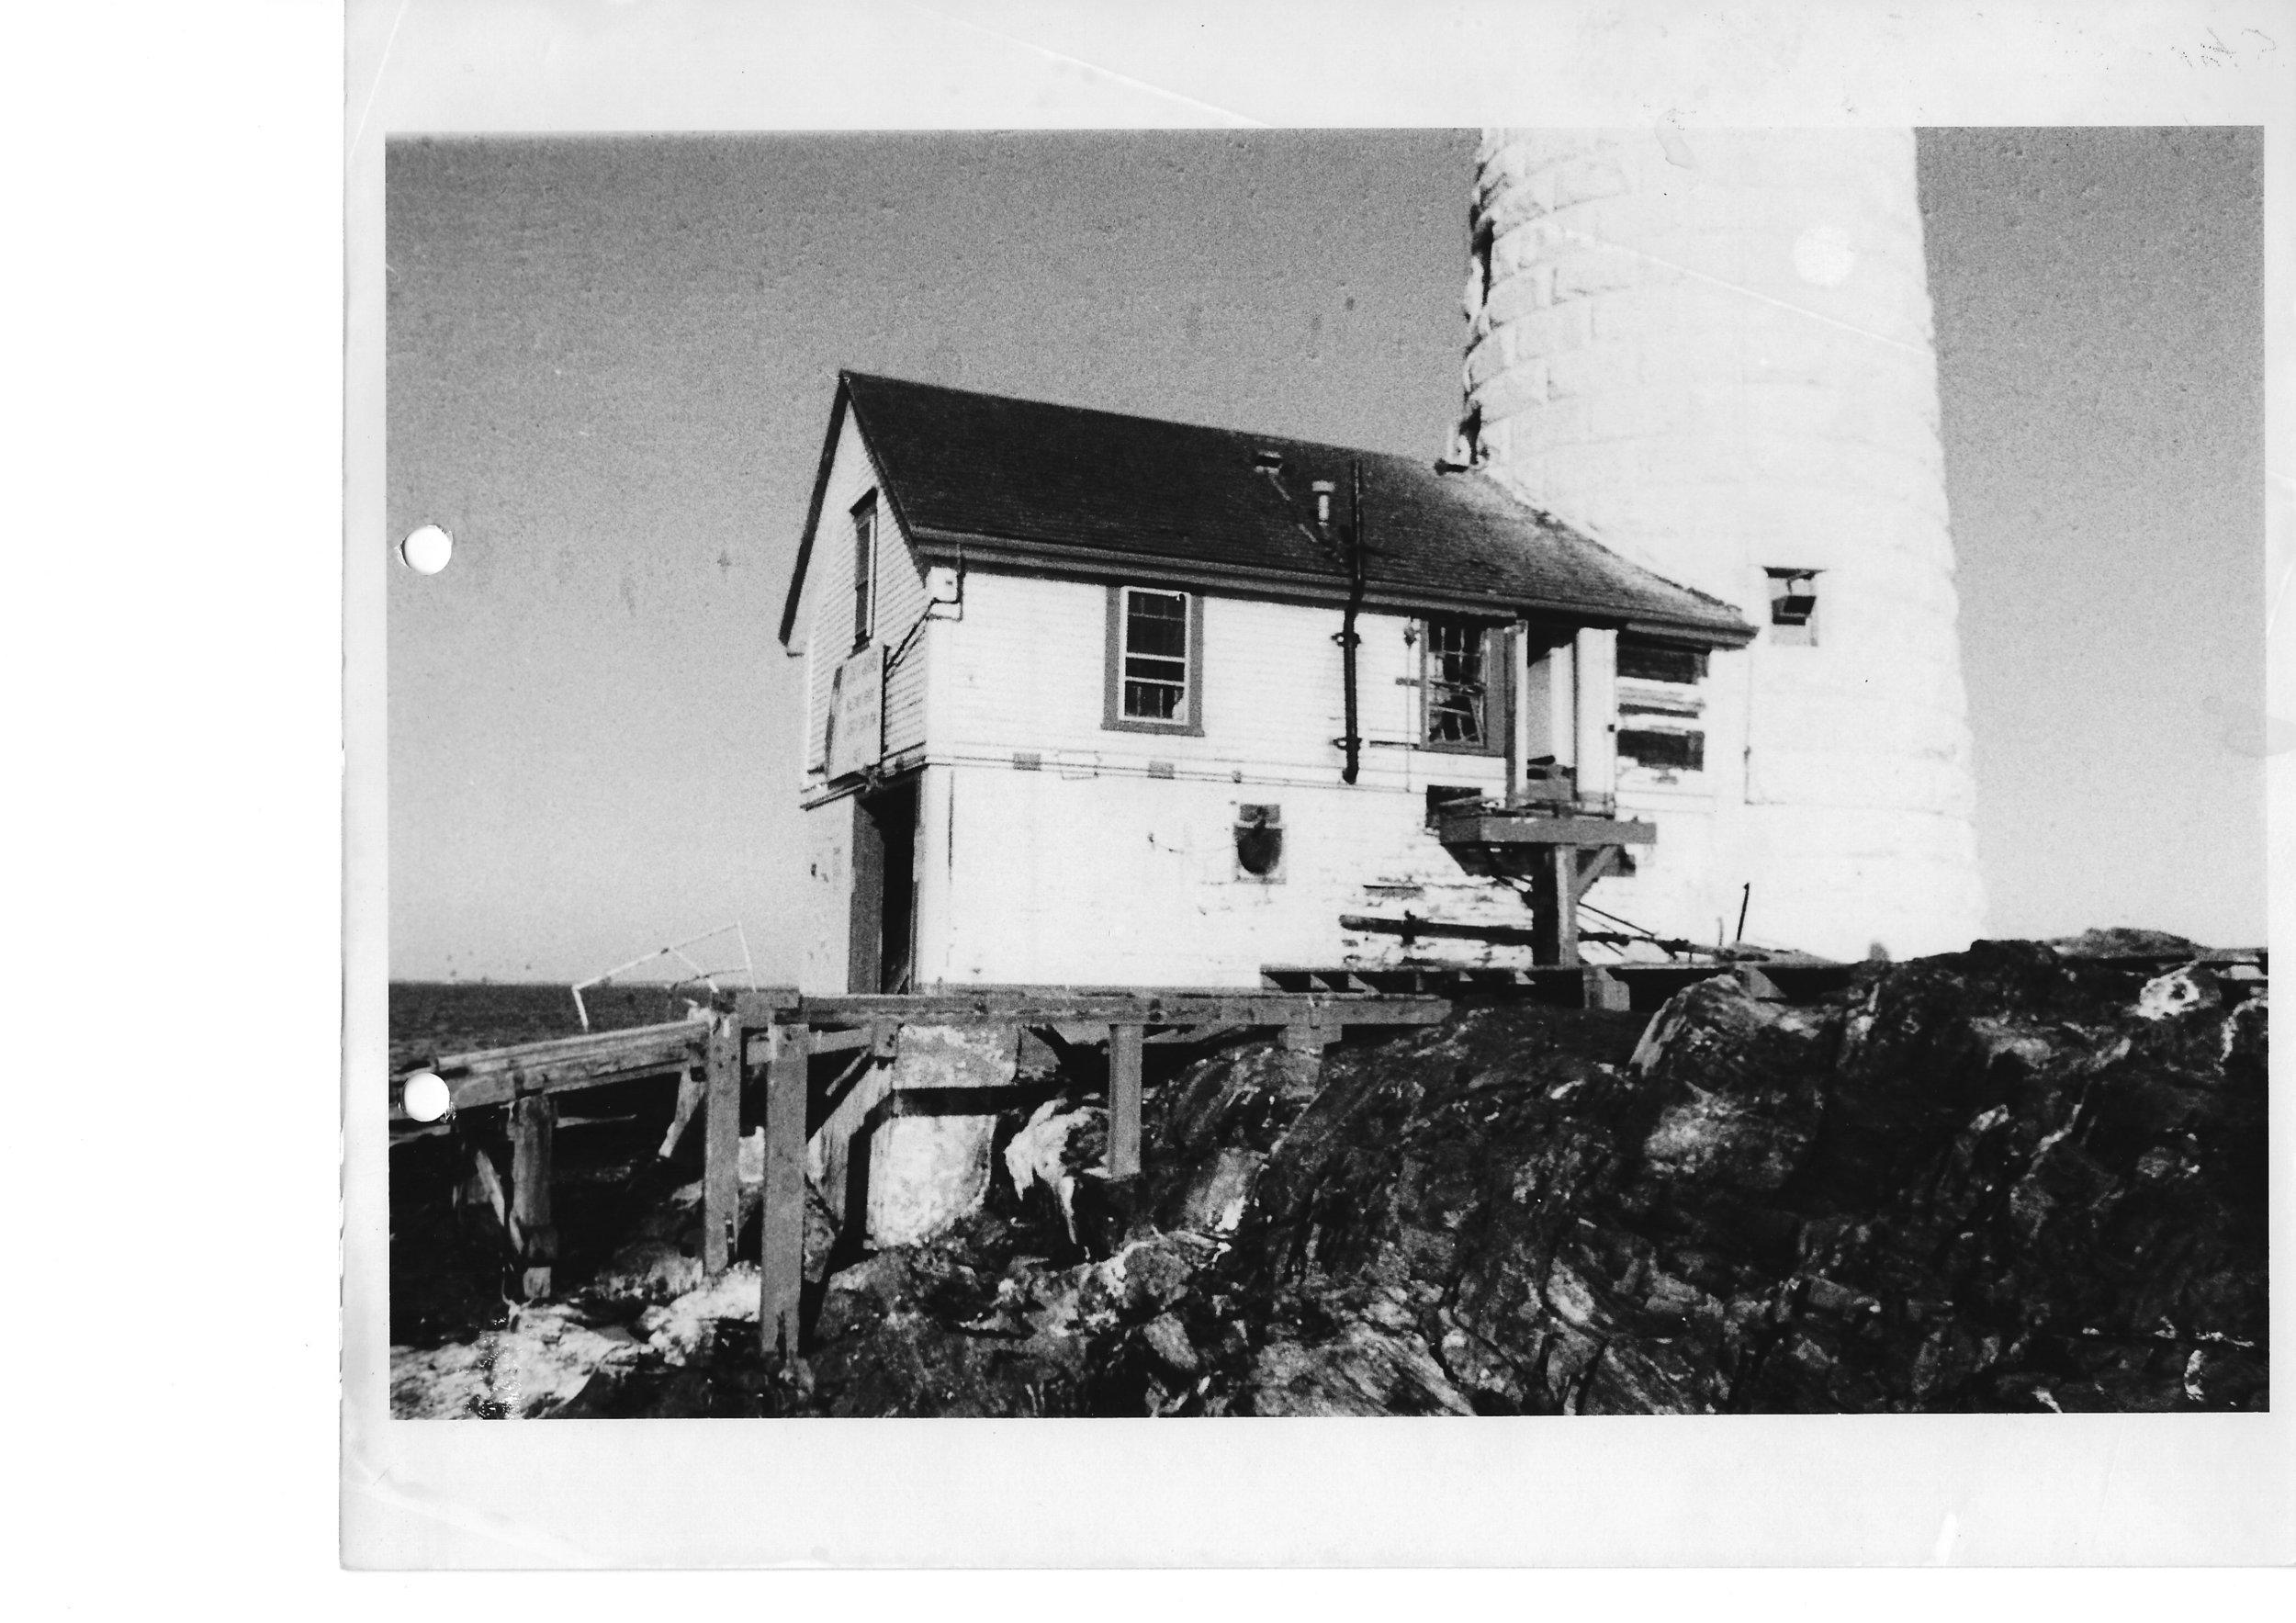 1978-Feb7StormDamage3.jpg